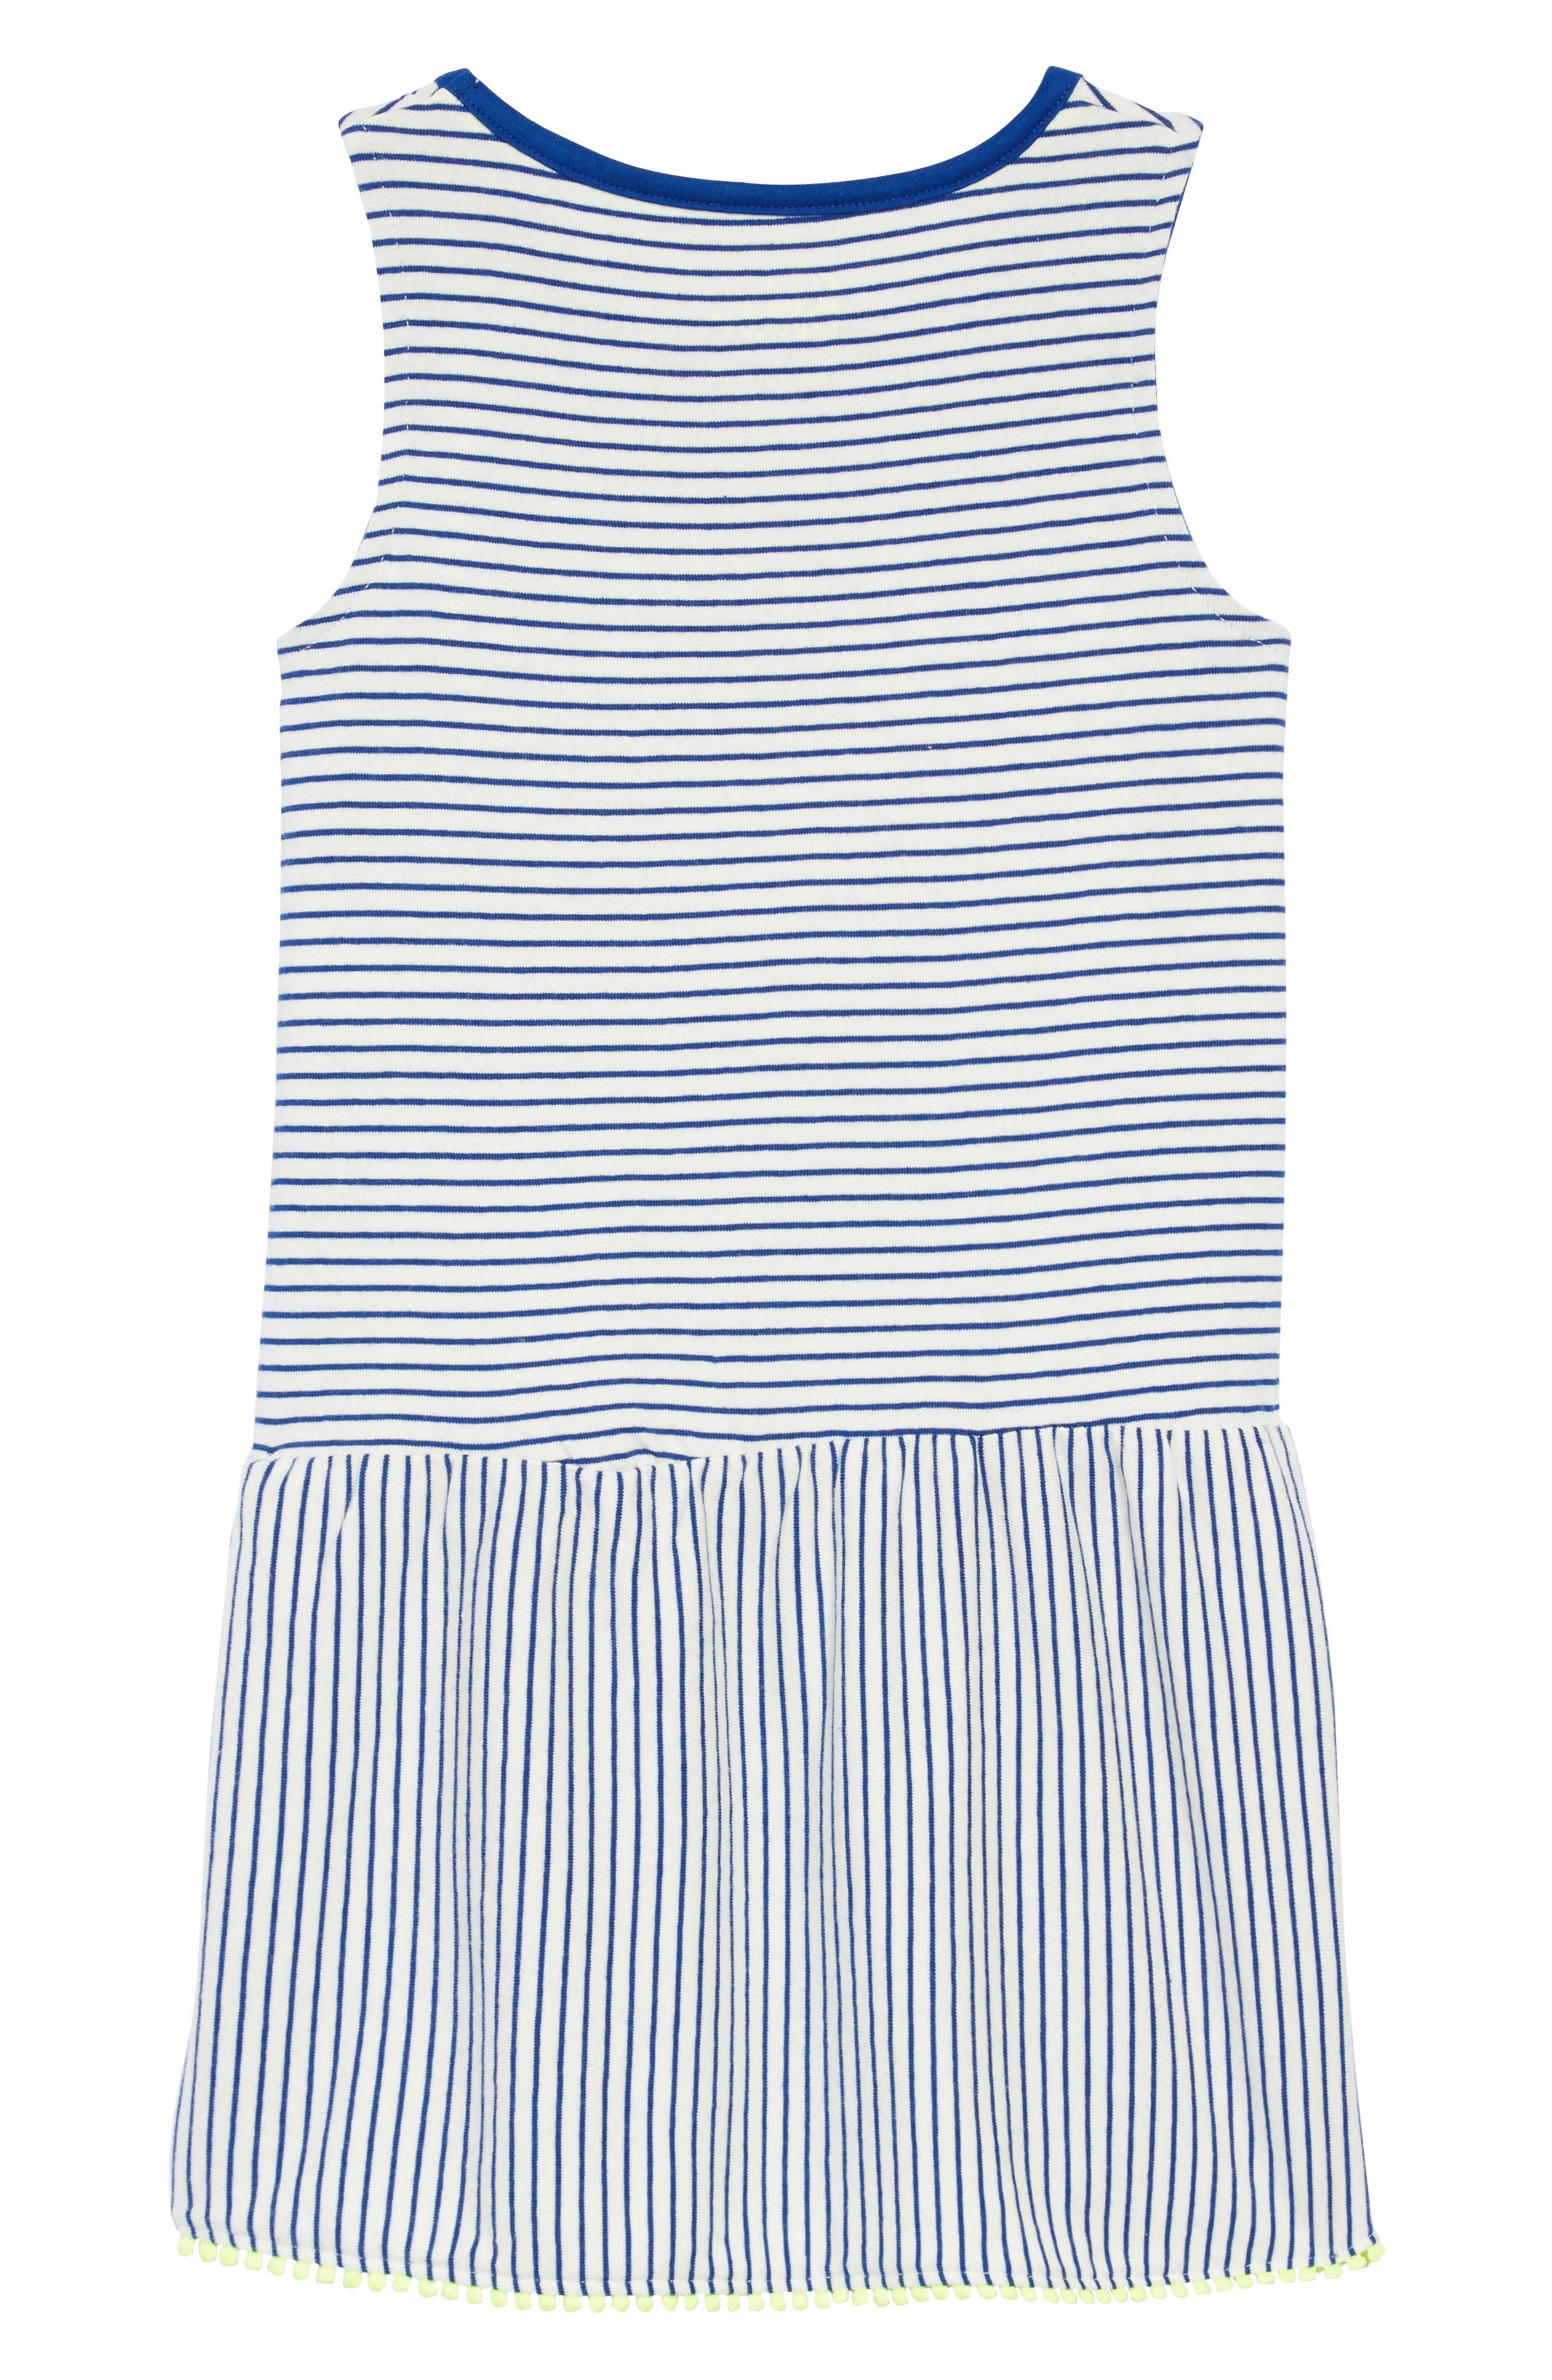 Drop-Waist Jersey Dress,                             Alternate thumbnail 2, color,